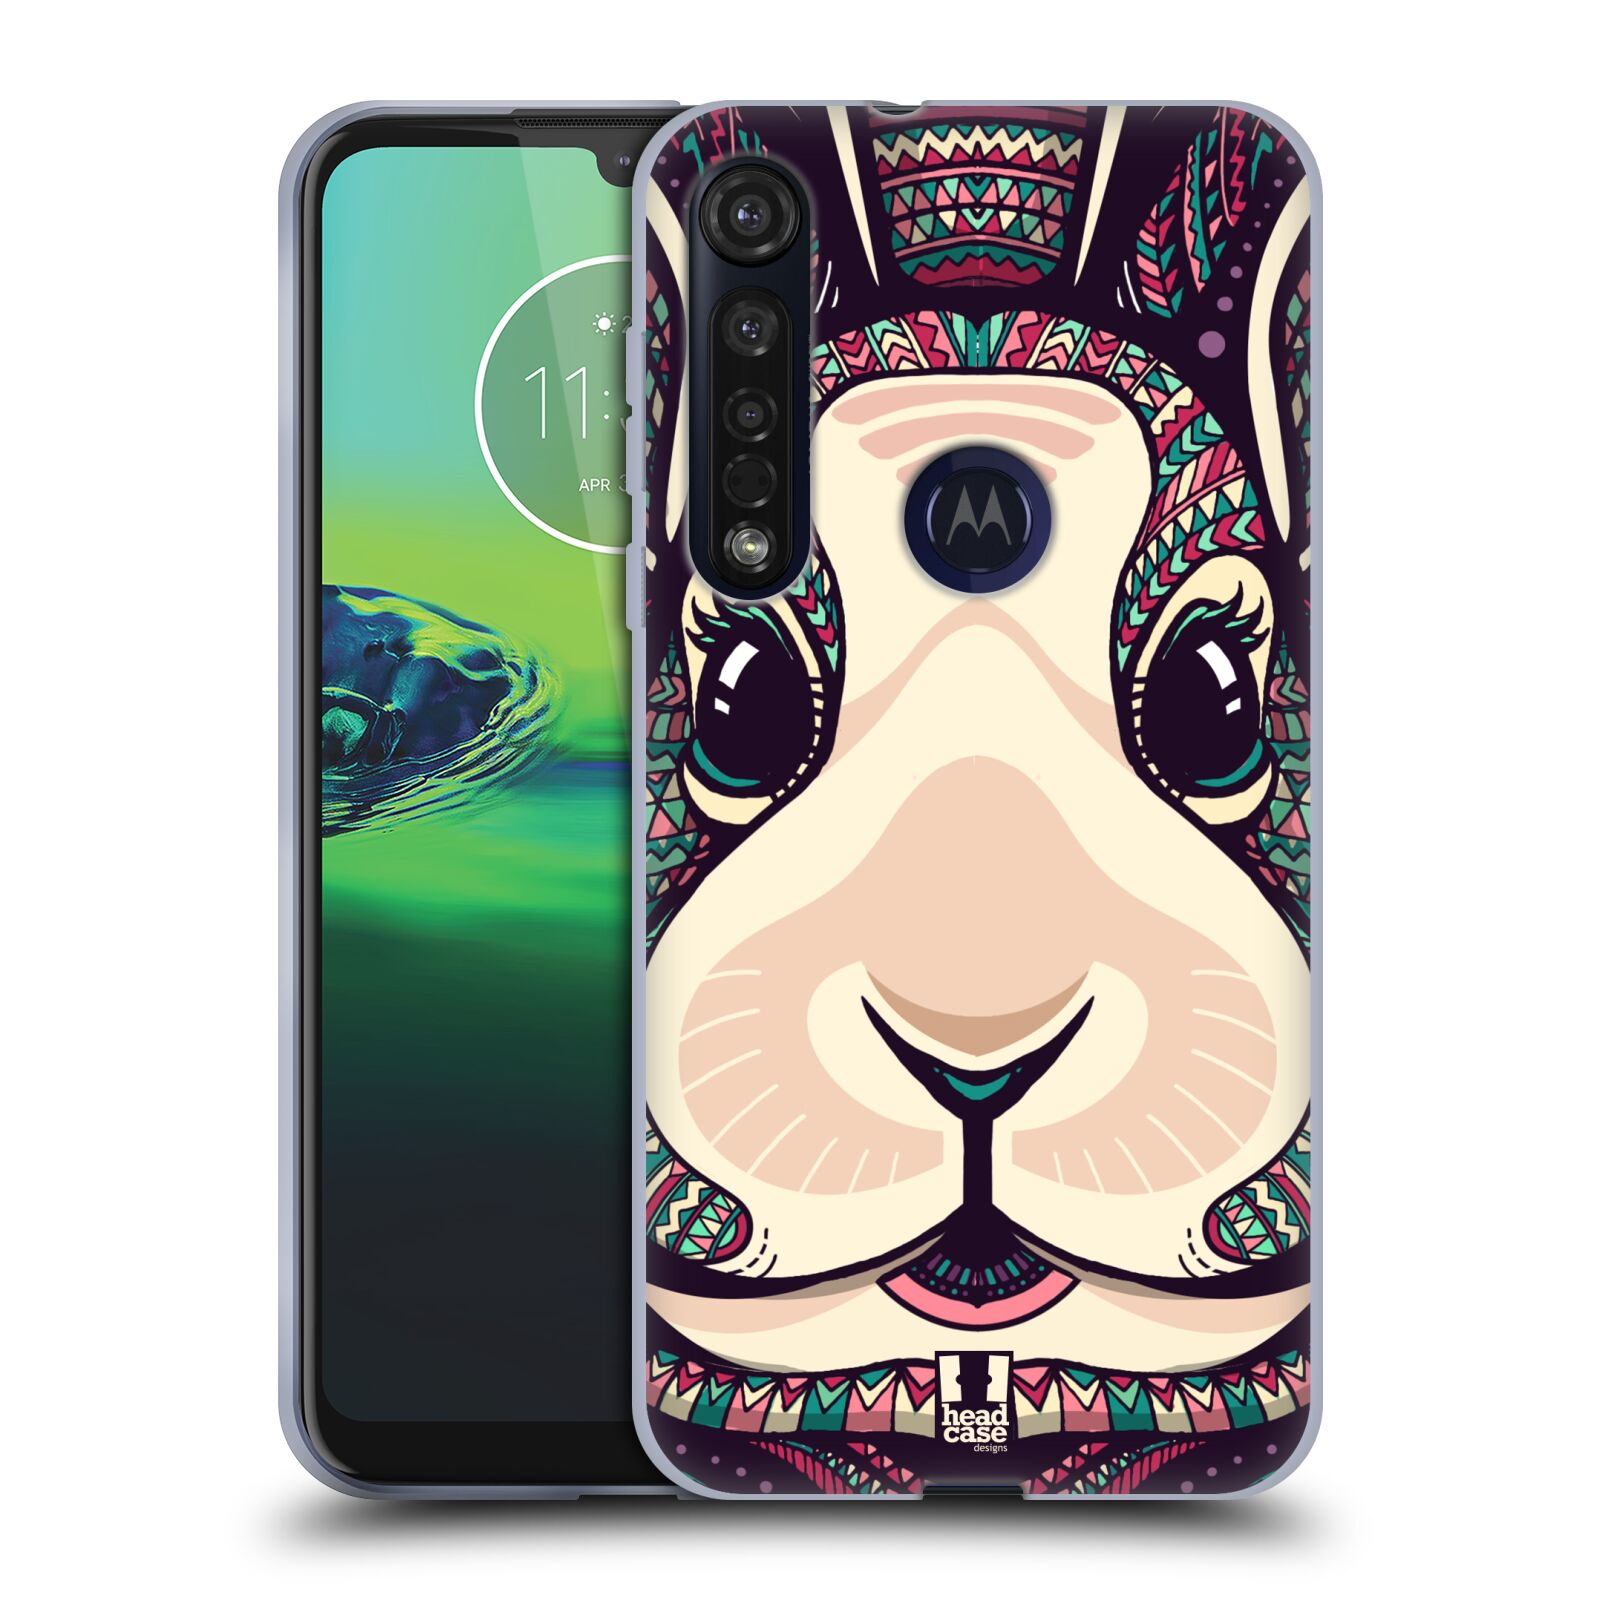 Silikonové pouzdro na mobil Motorola Moto G8 Plus - Head Case - AZTEC ZAJÍČEK